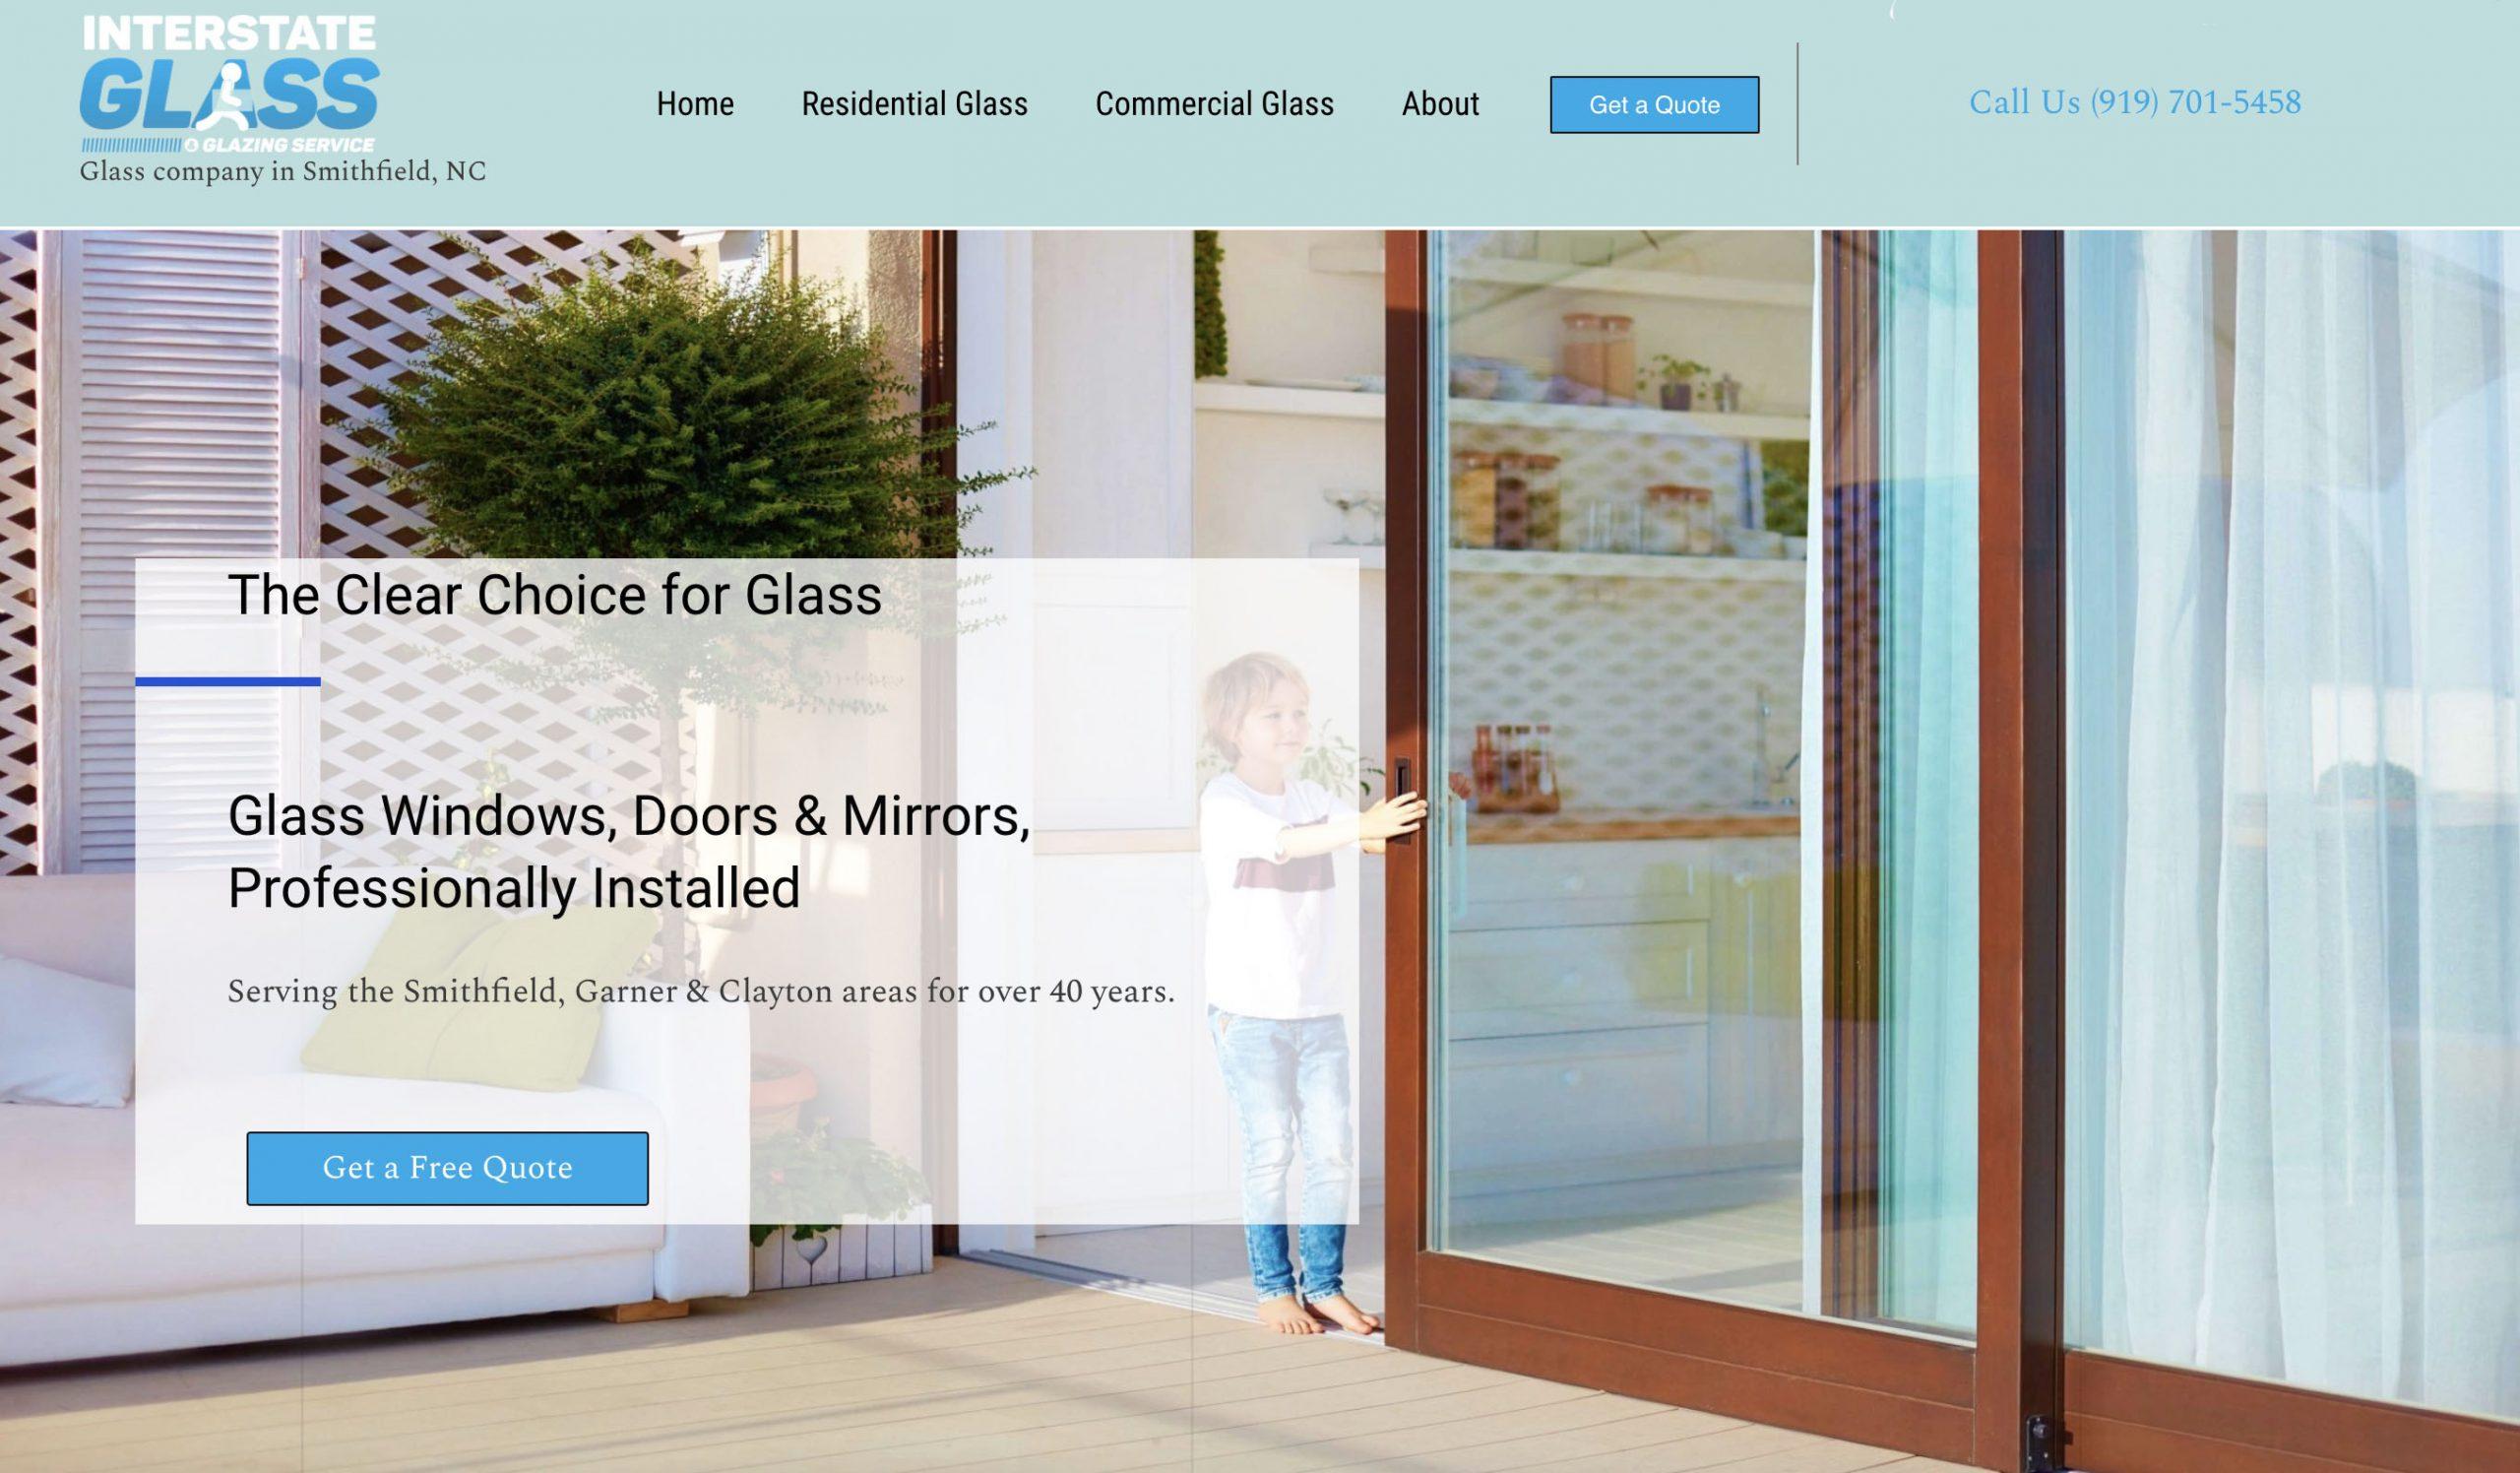 Interstate Glass website Smithfield NC